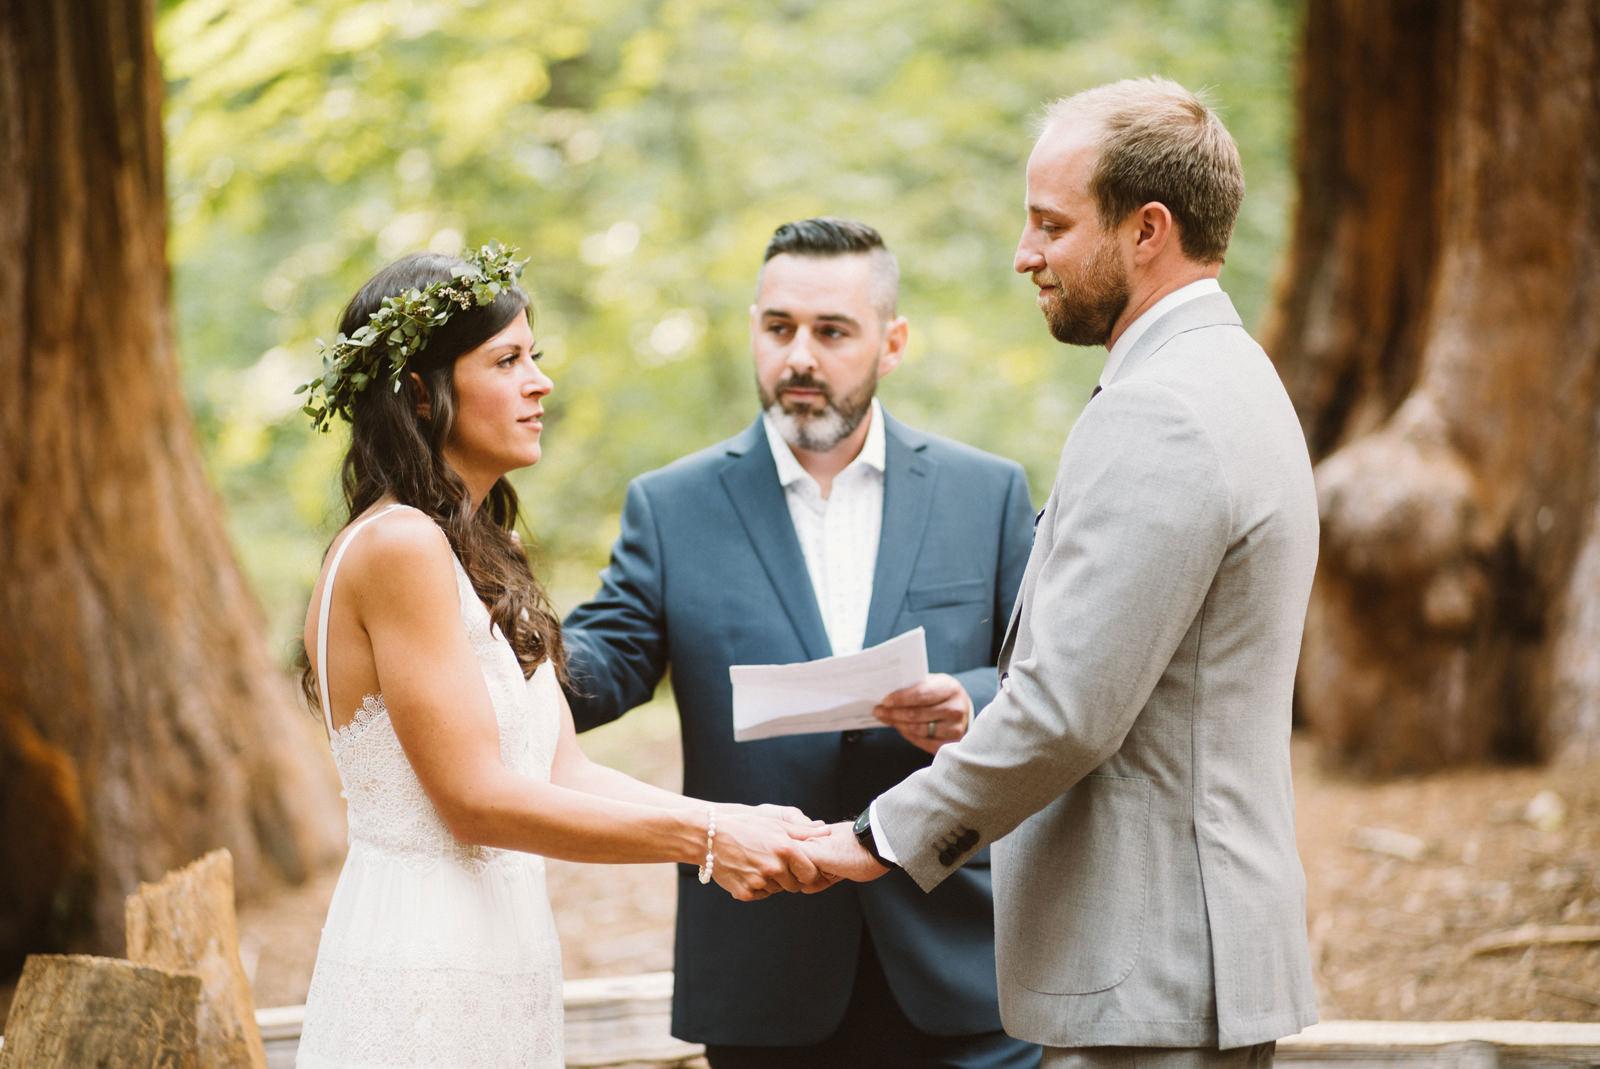 yosemite-intimate-wedding-058 YOSEMITE INTIMATE WEDDING